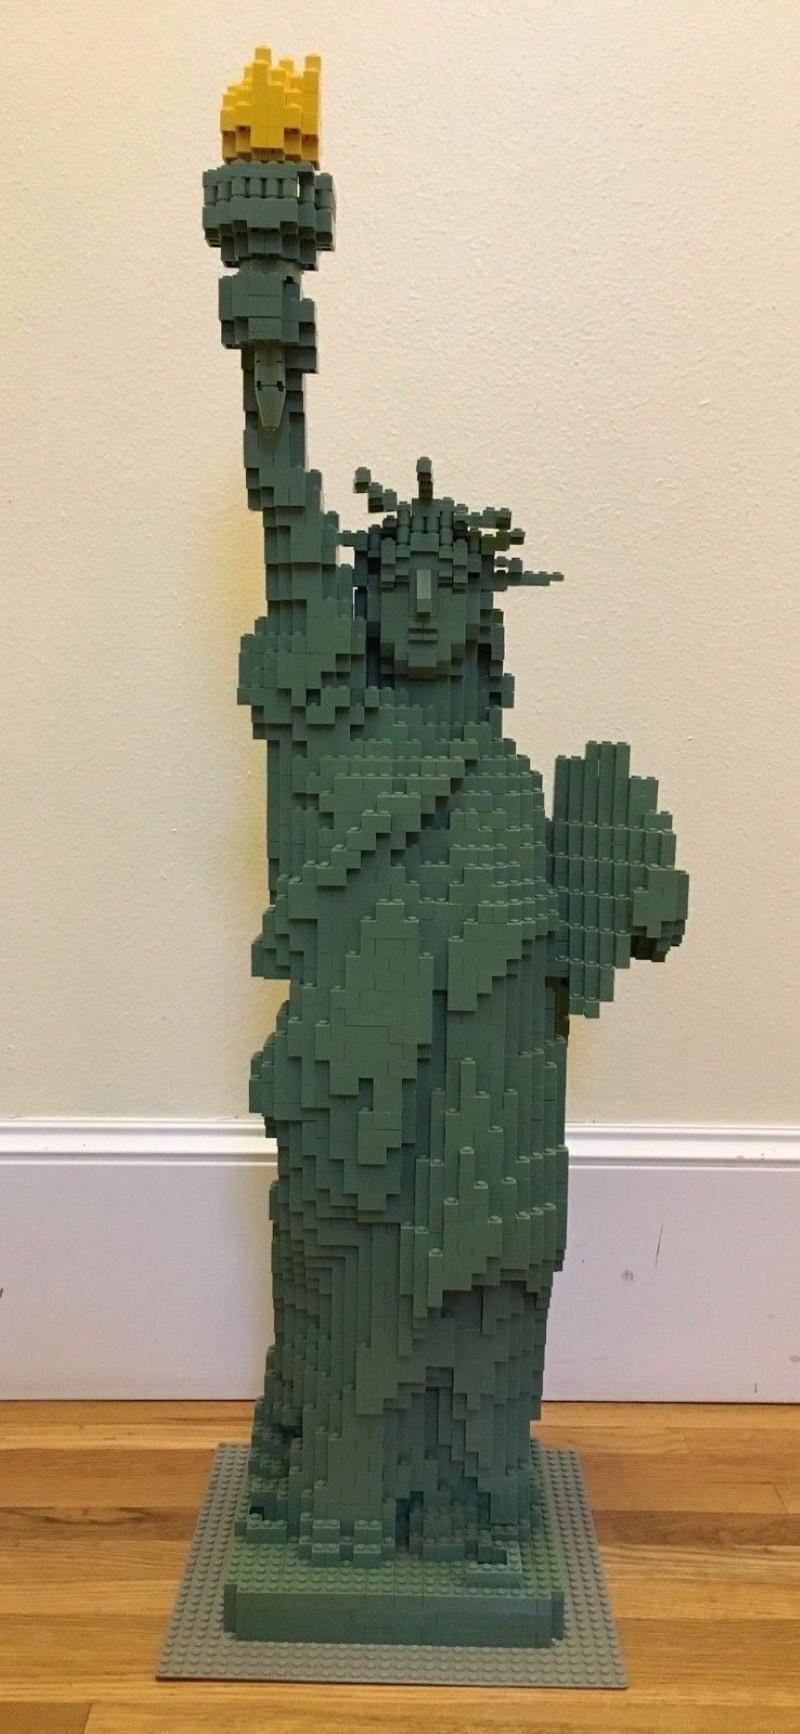 Statue of Liberty Lego set